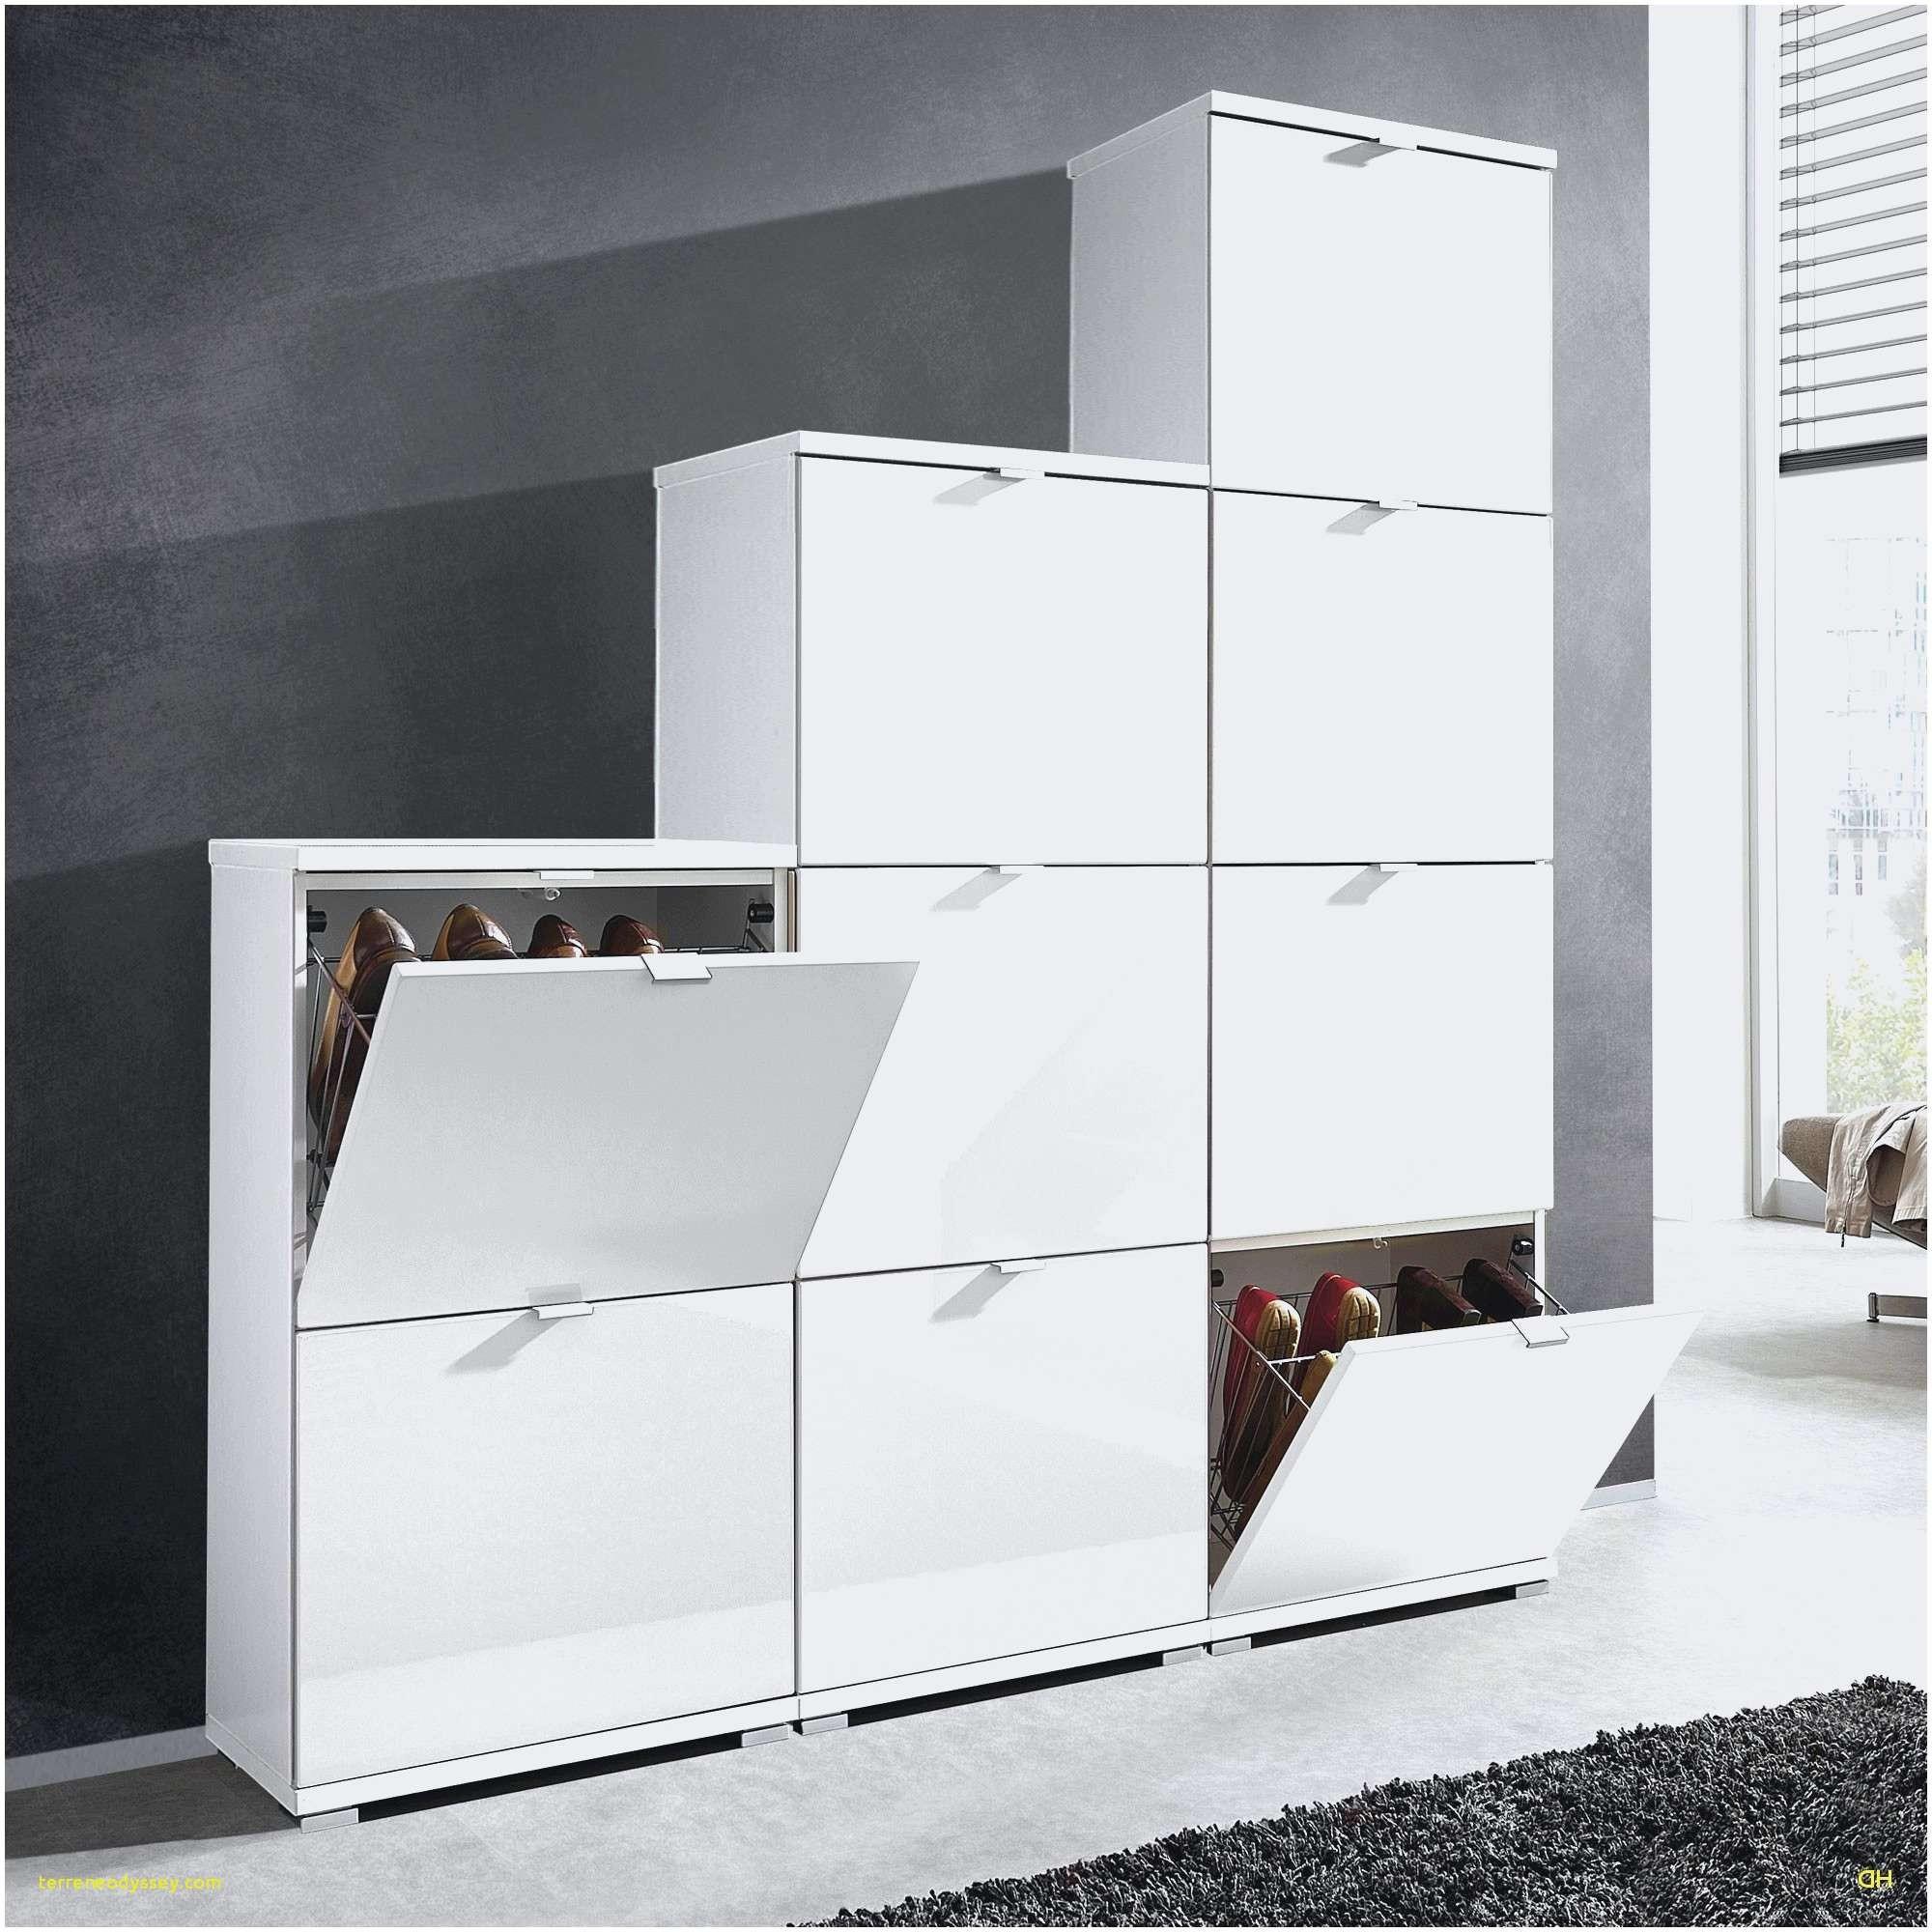 Meuble Profondeur 35 Cm Meuble Profondeur 15 Cm Meuble ... tout Canapé Faible Profondeur Ikea